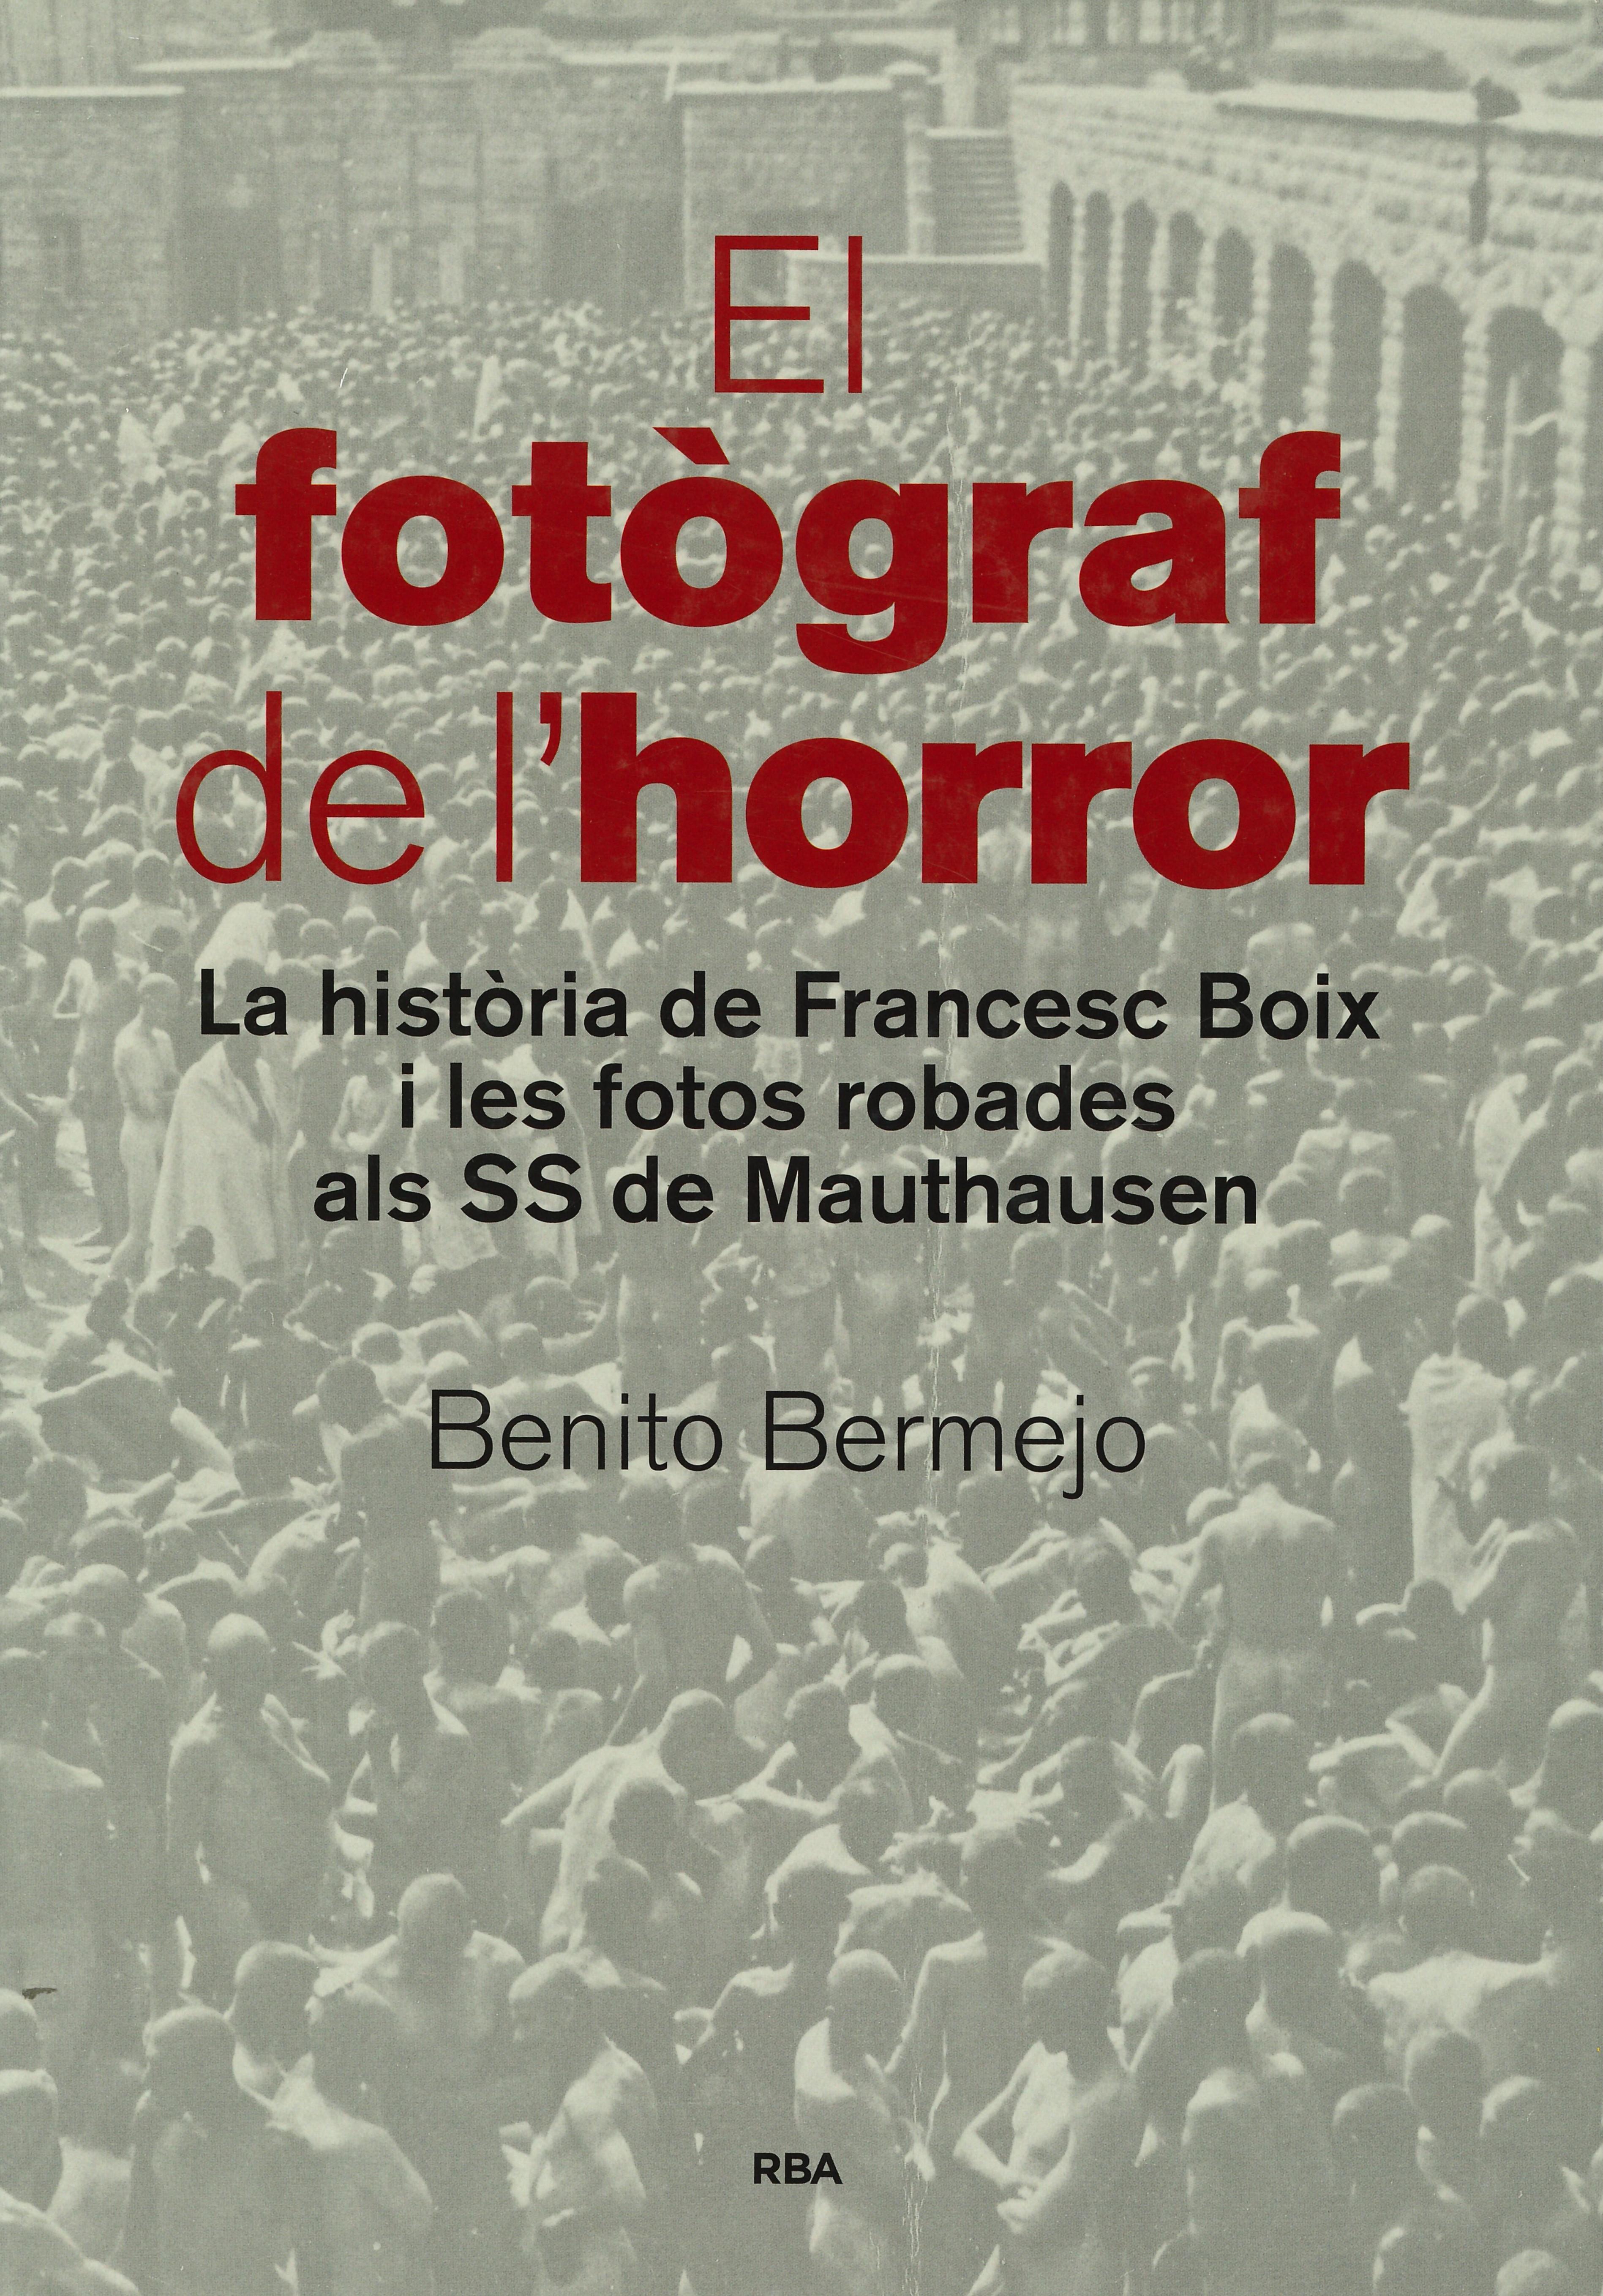 fotograf_del_horror.jpg